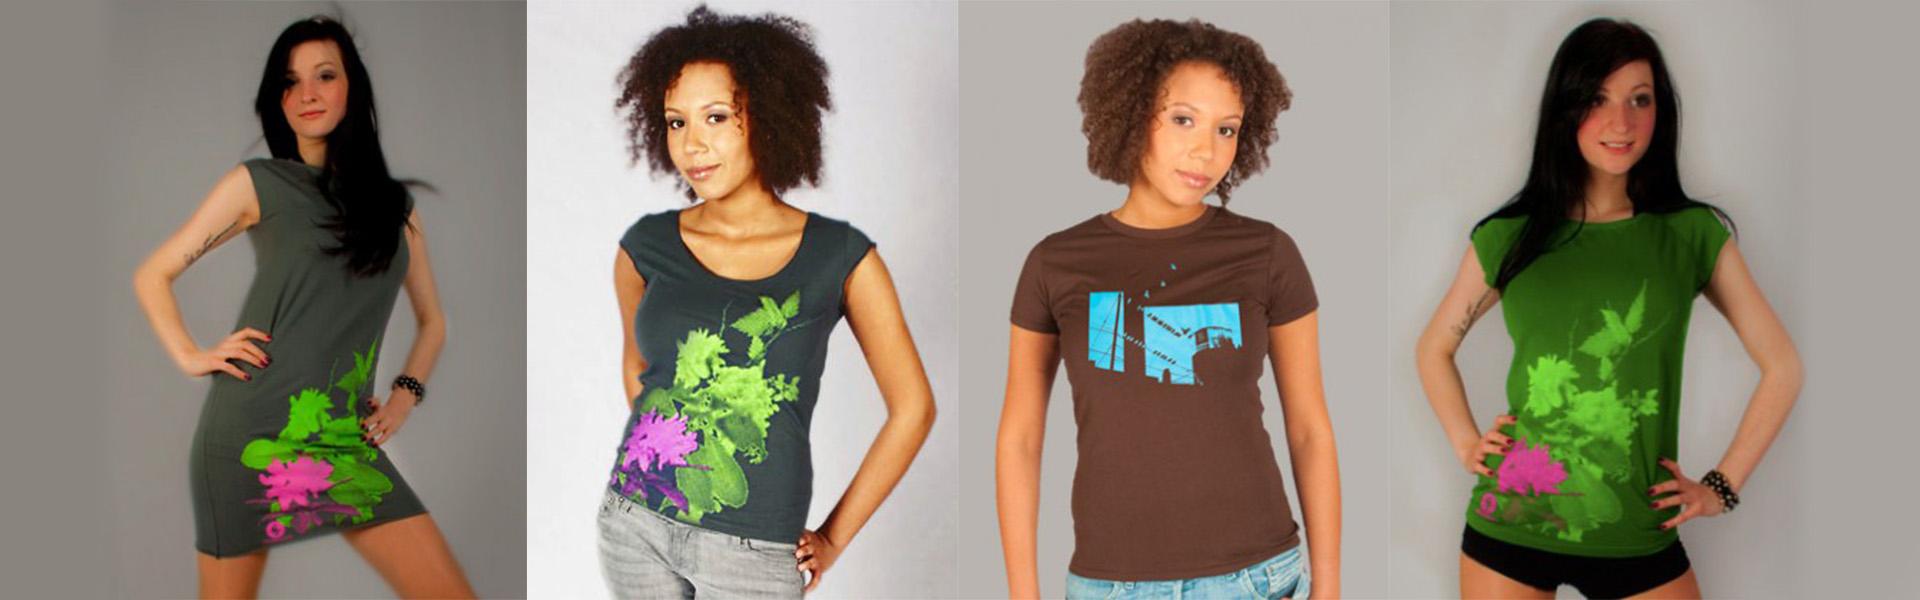 waldbrand clothing, shirts, siebdruck,textildruck, bekleidung, grafikdesign shirts, models, fotomodel, fotoshooting, fotografie, fotograf, essen, ruhrgebiet, bochum, produktfotografie